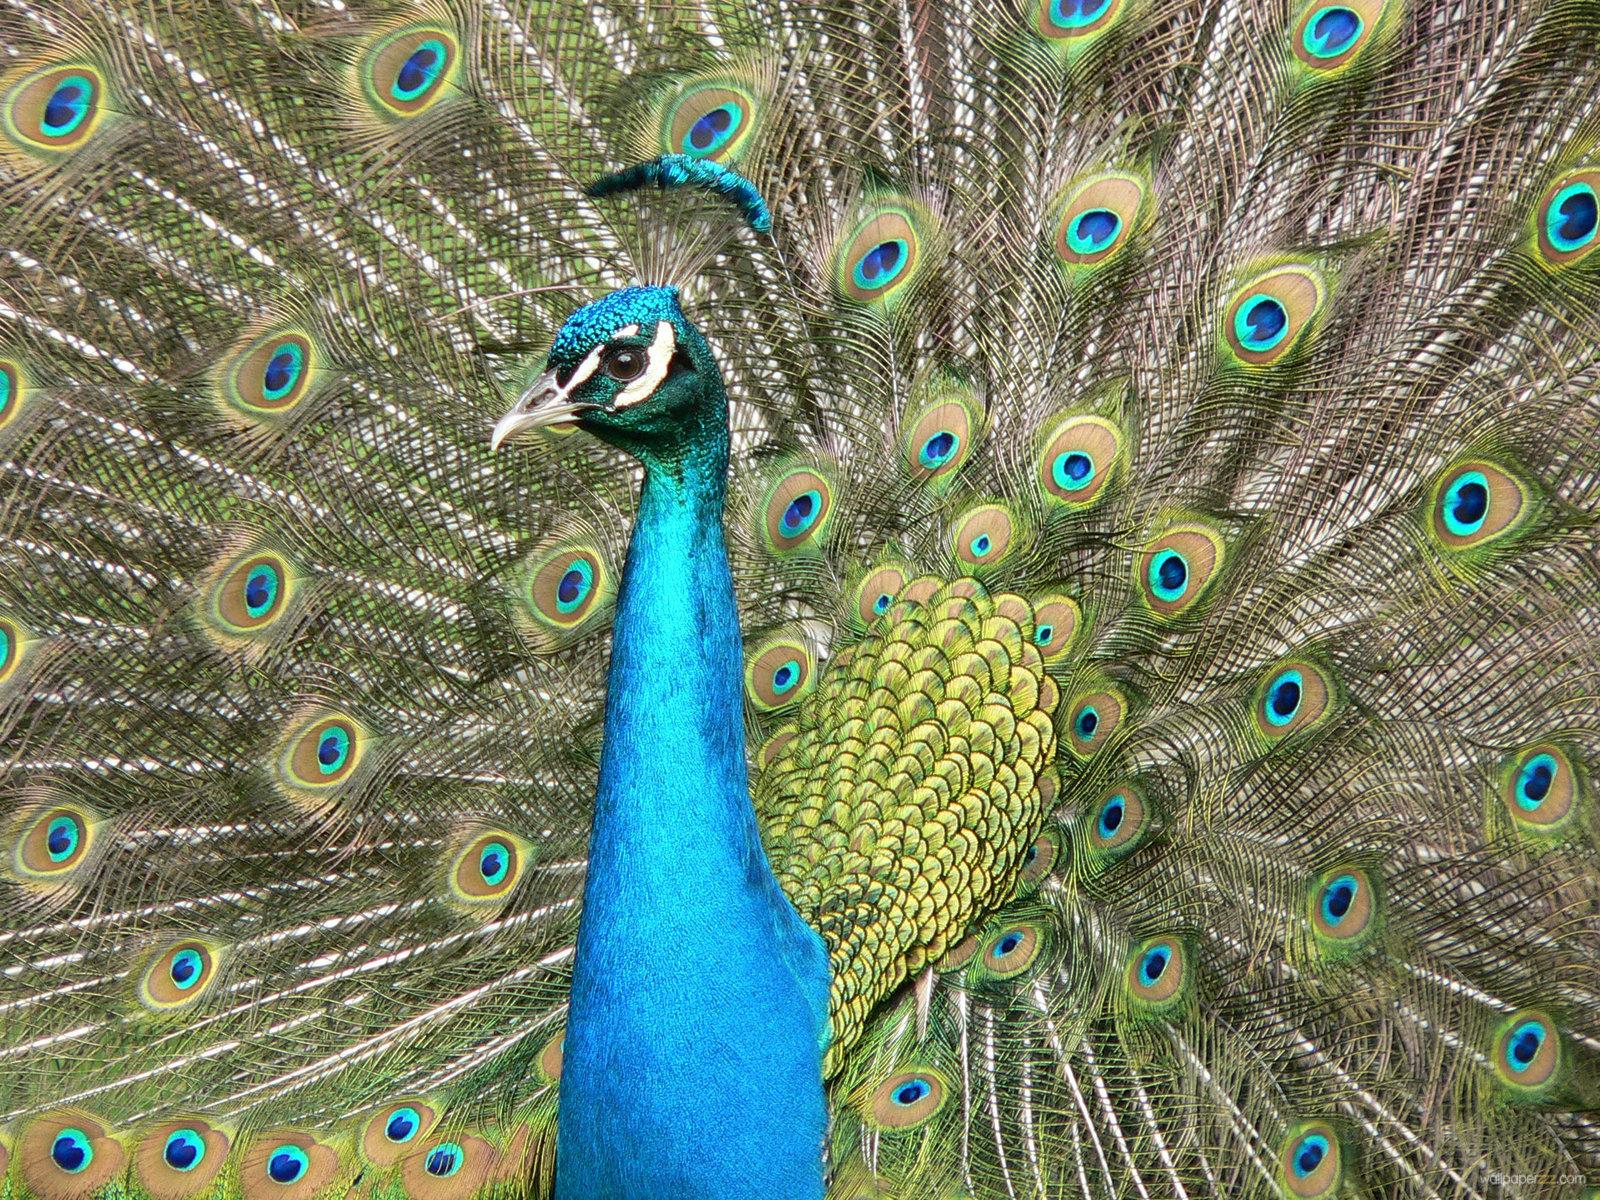 Free Download Wallpaper: Beautiful Peacock Wallpapers Free Download